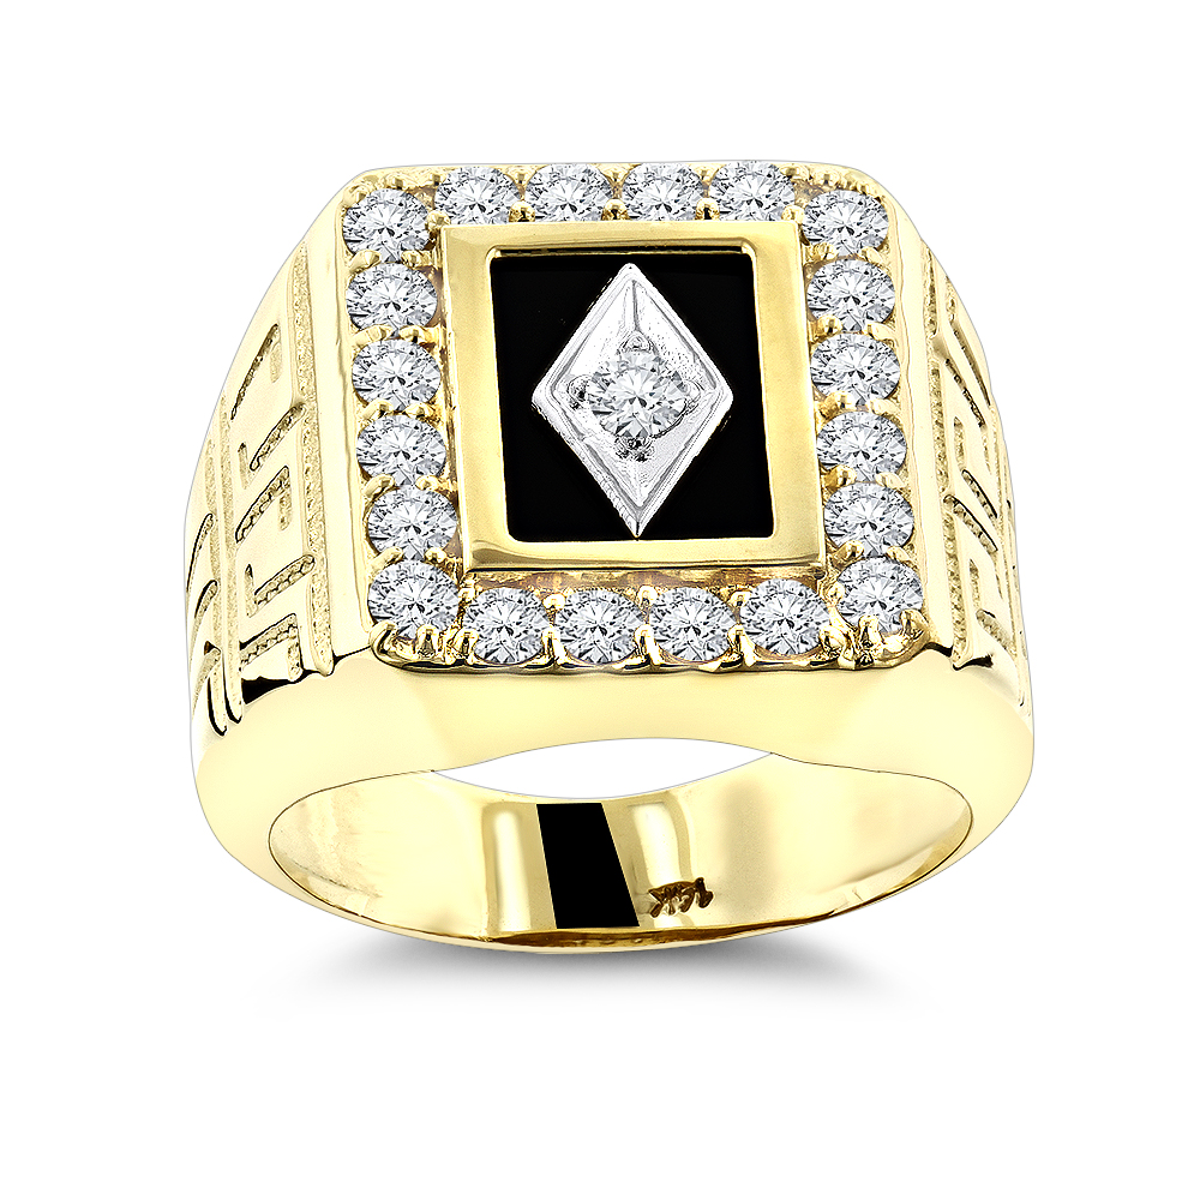 Black Onyx and Diamond Rings 14K Gold Mens Ring 1.68ct